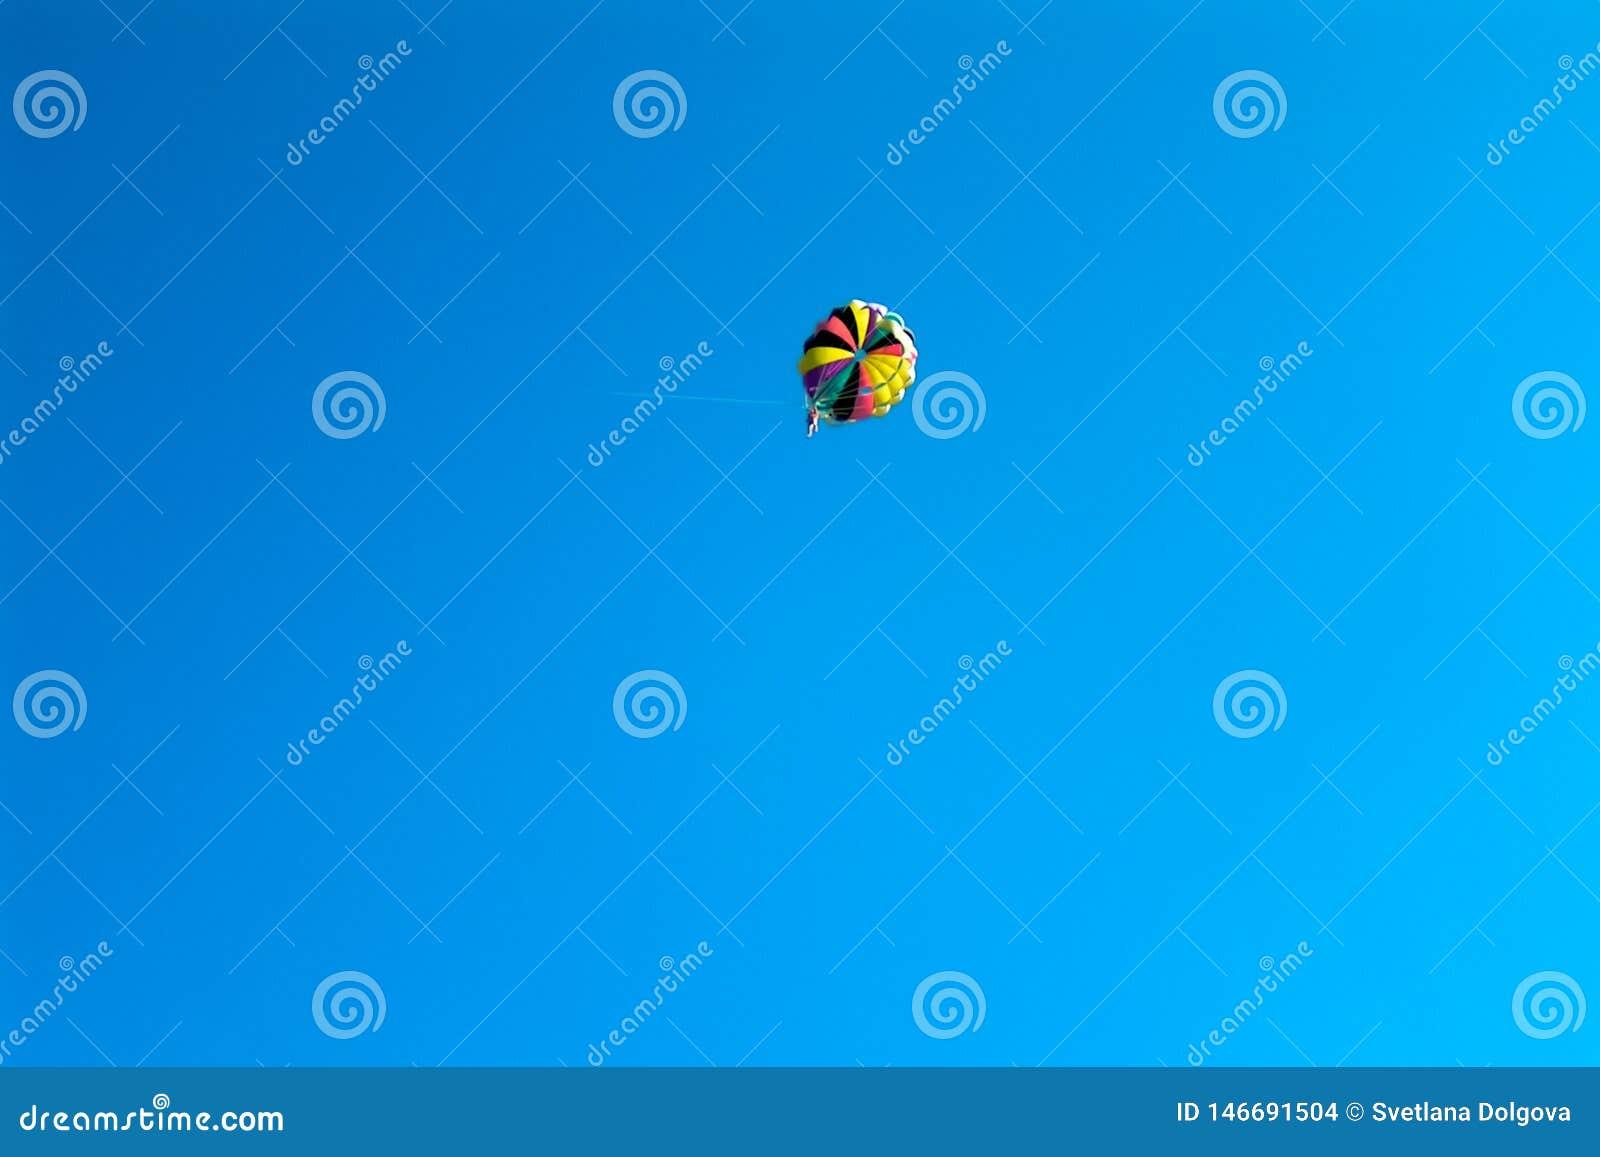 Skydiver που πετά στο χρωματισμένο αλεξίπτωτο στον μπλε σαφή ουρανό